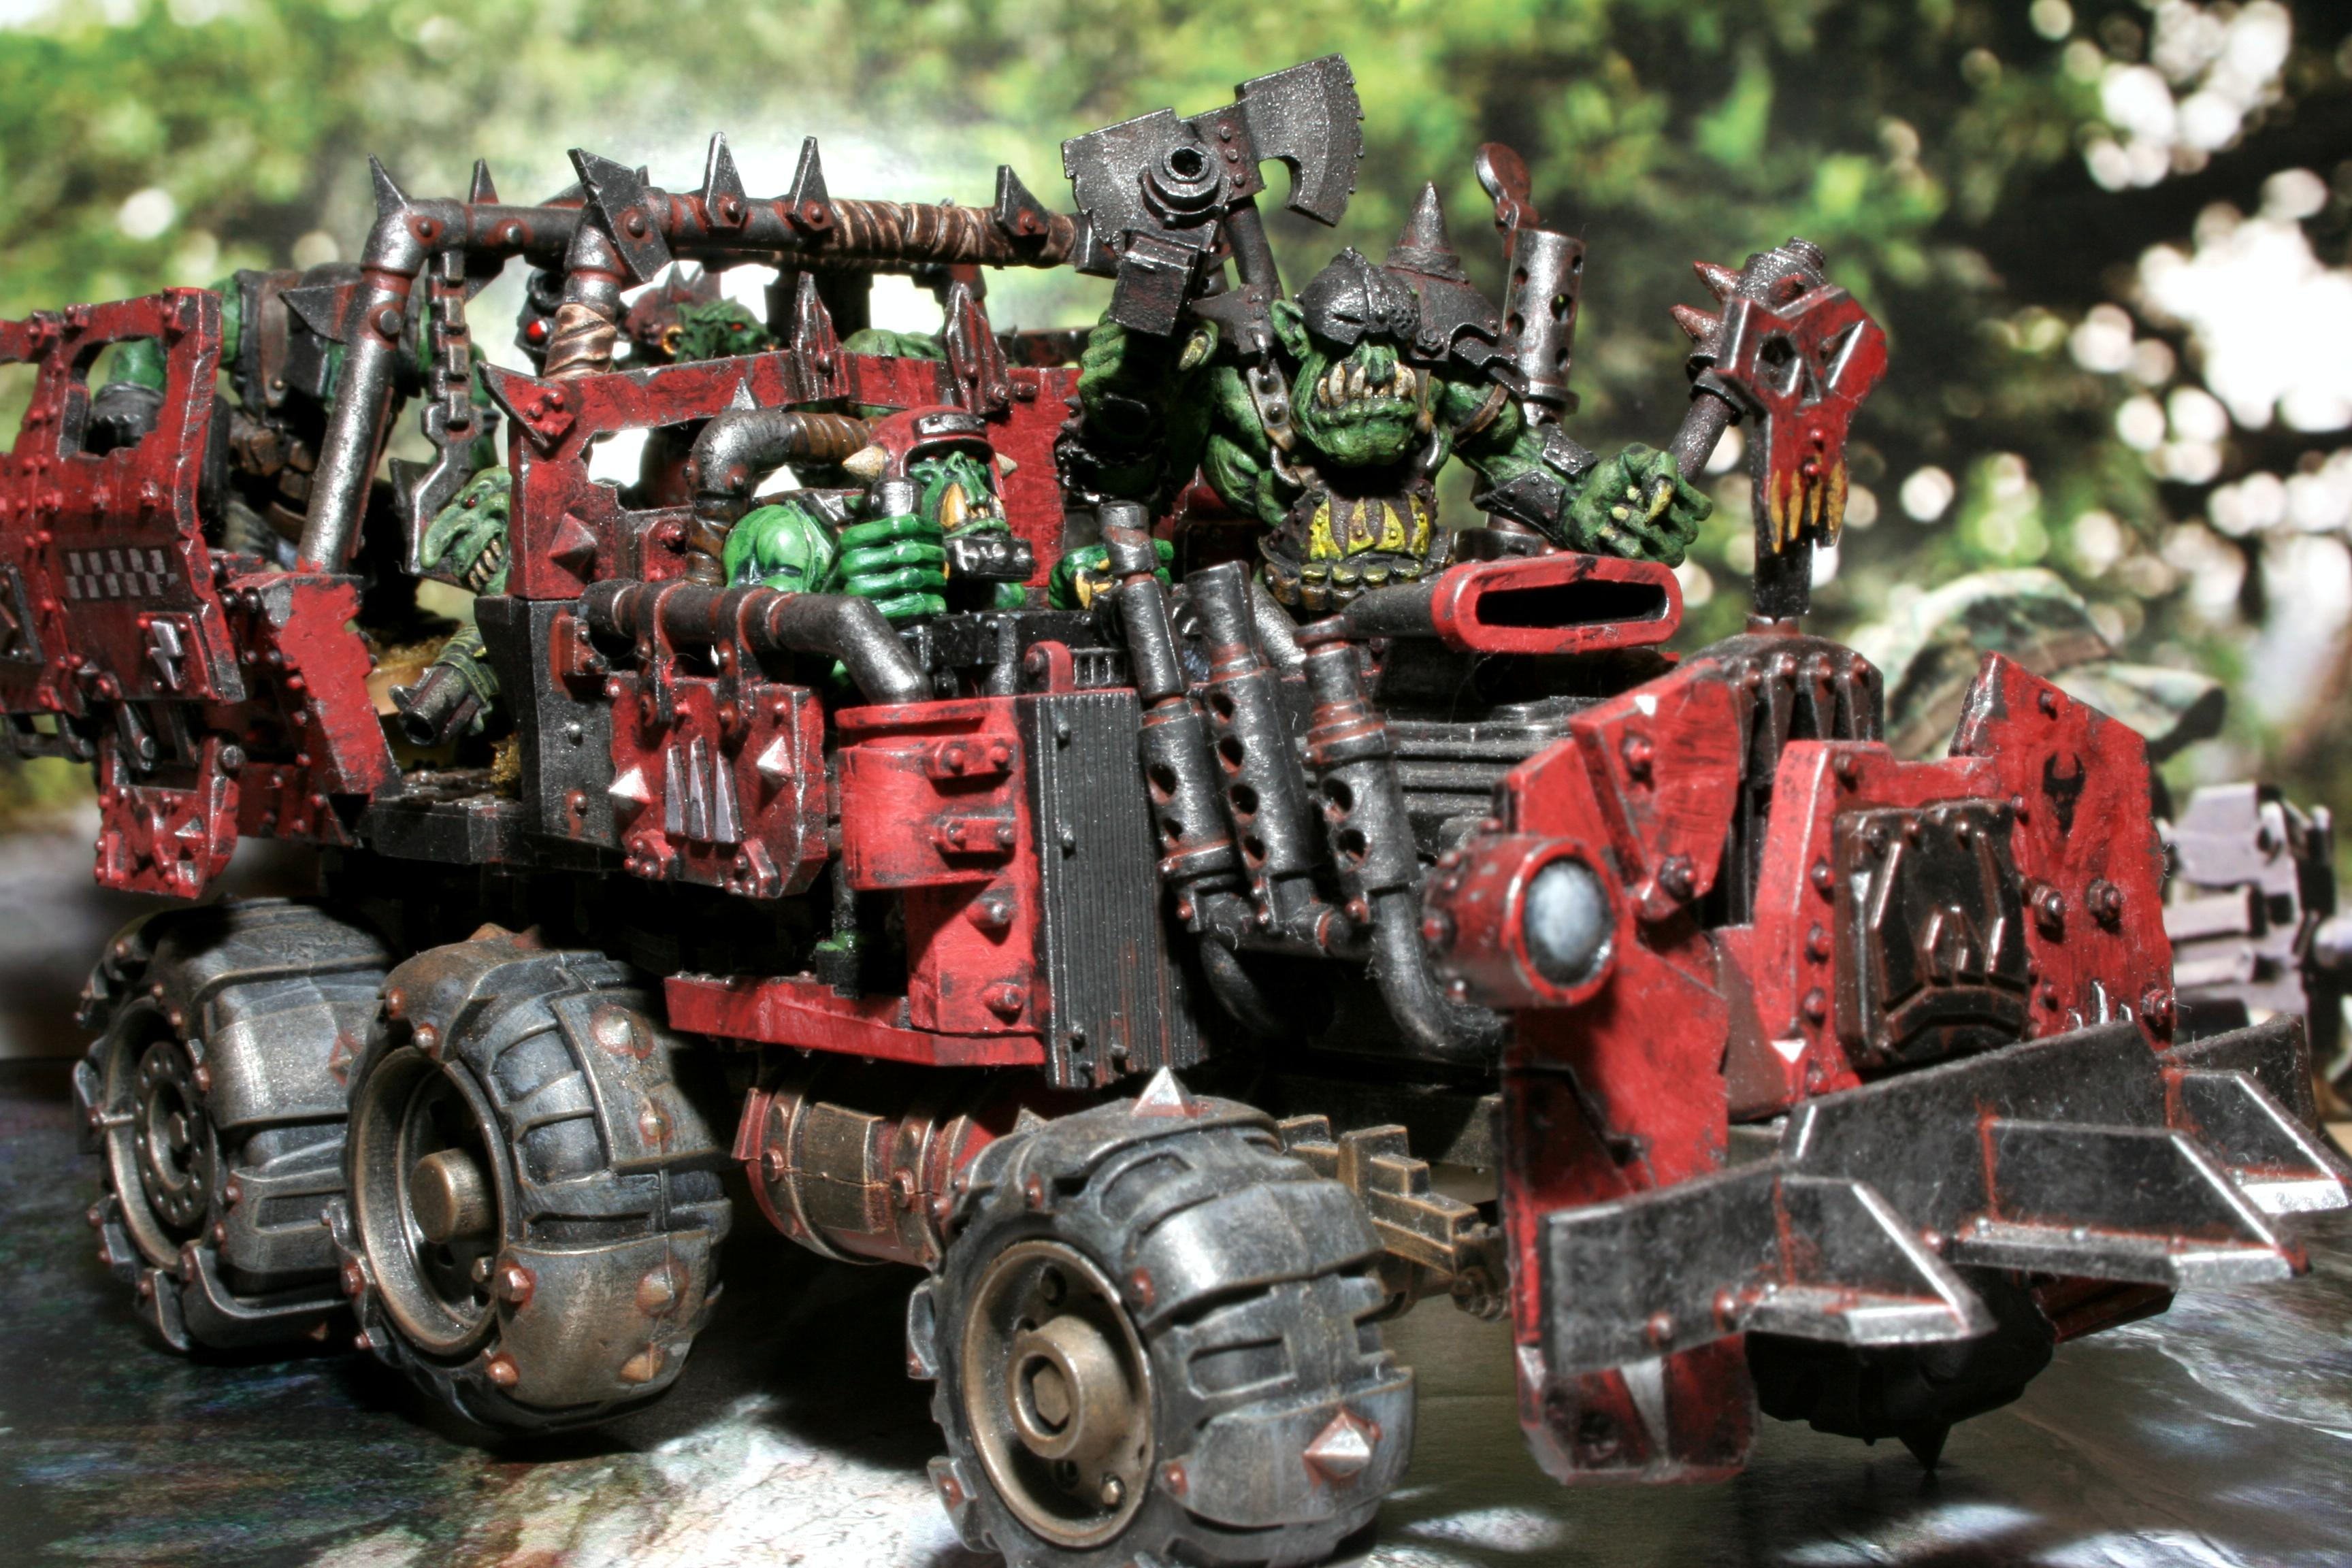 Orks, Trukk, Warhammer 40,000